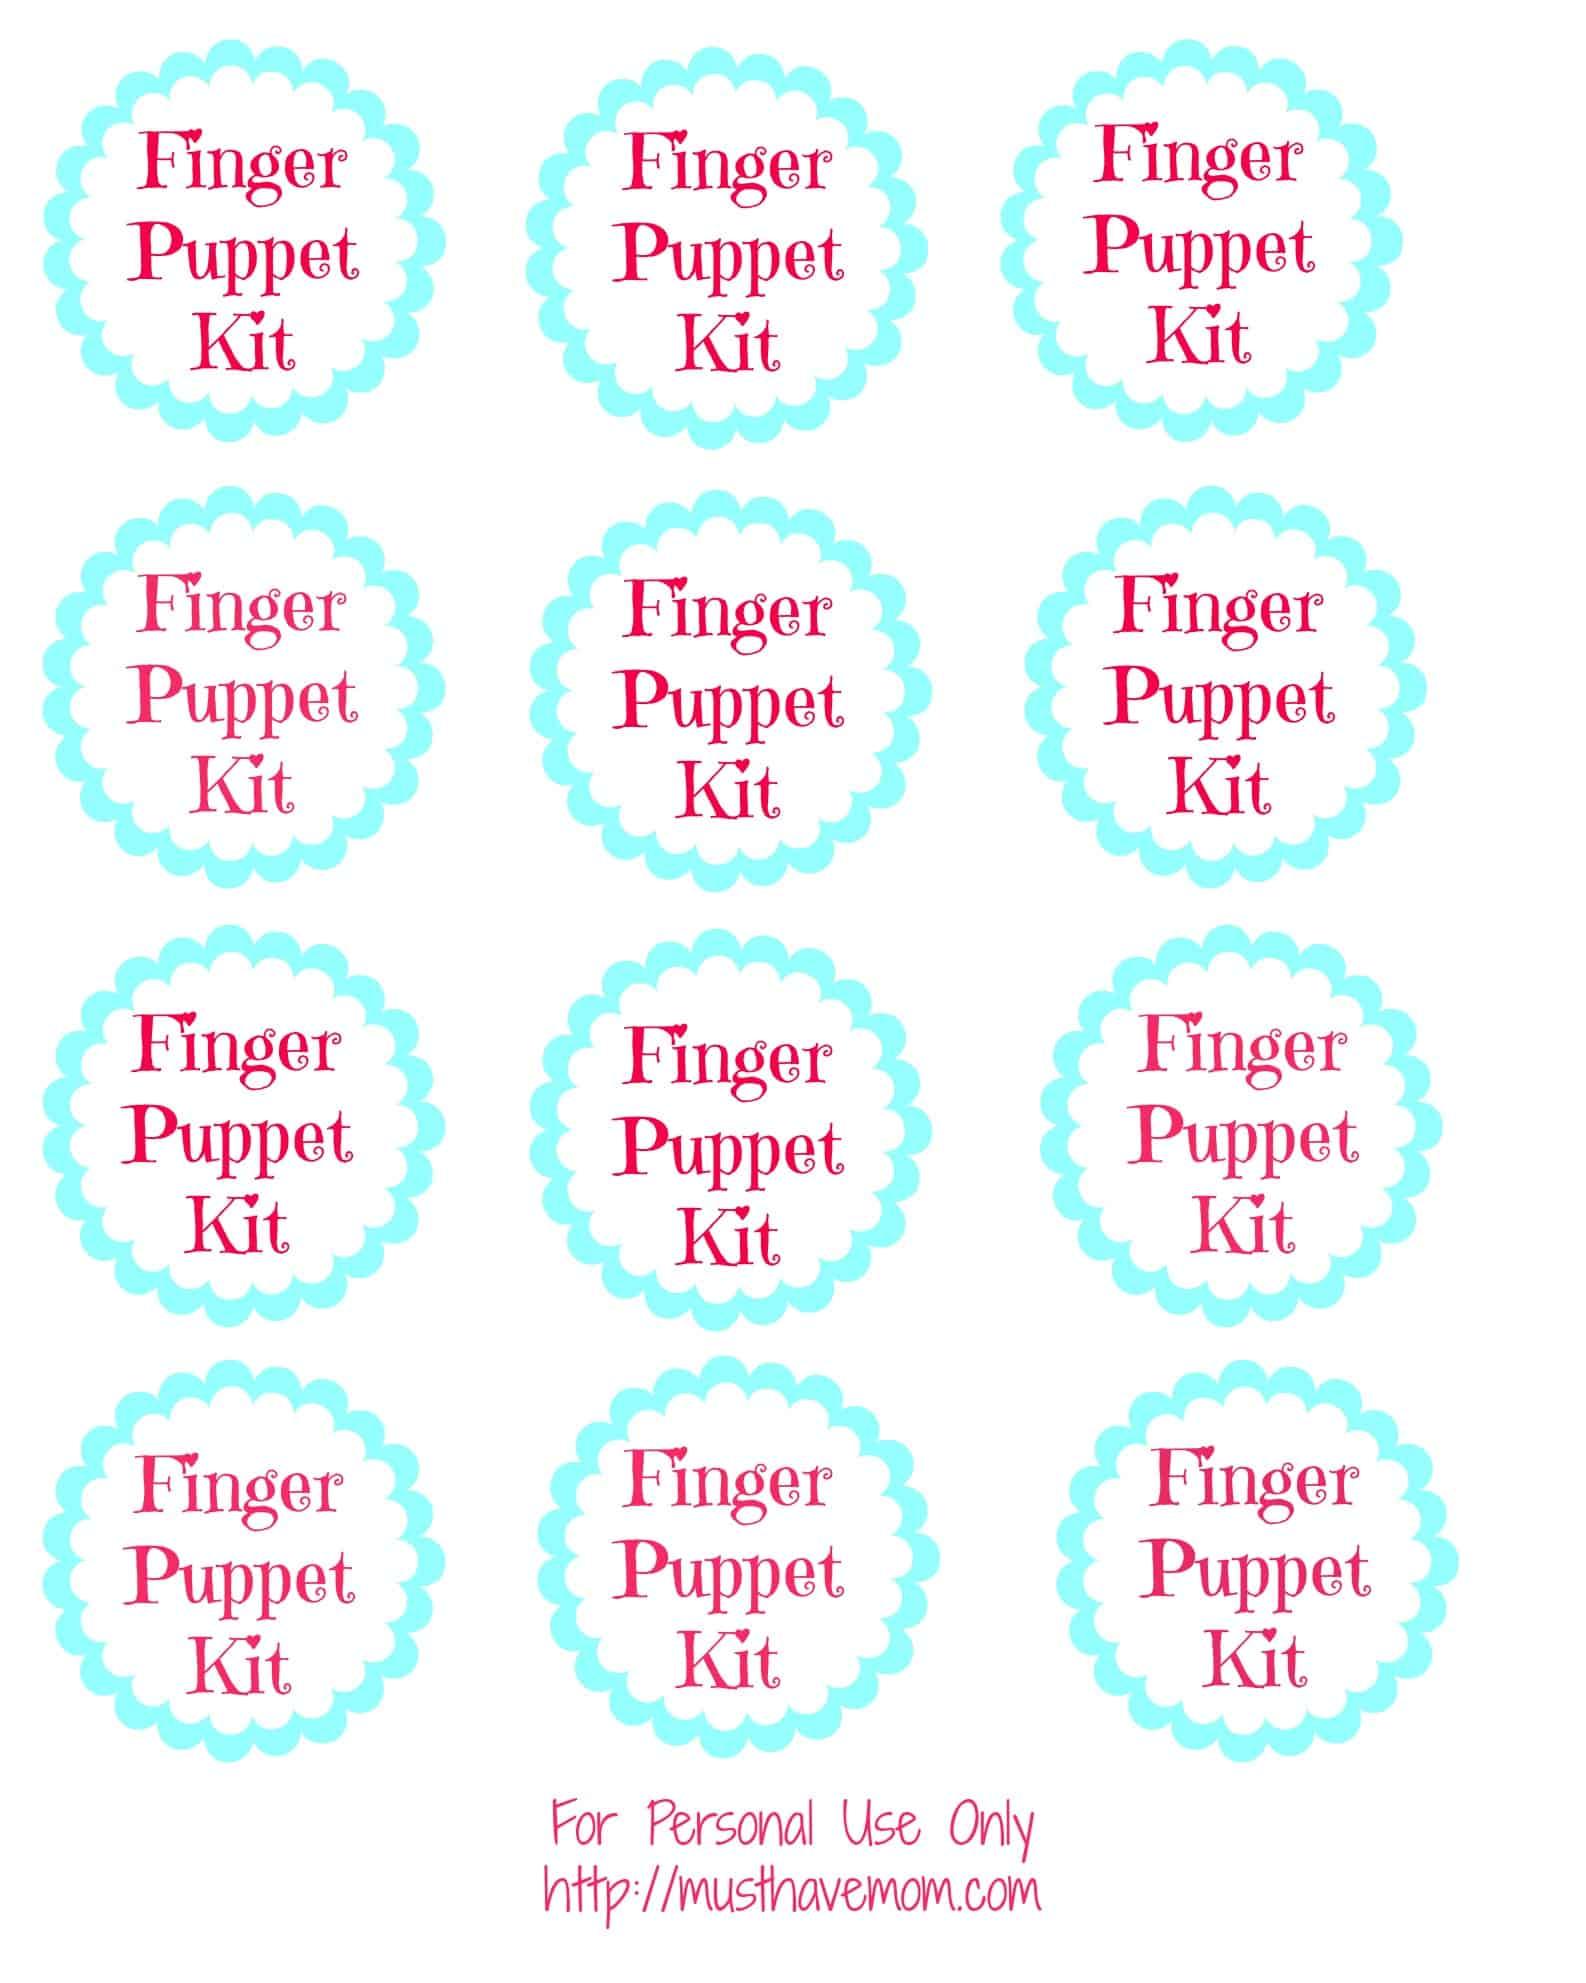 Finger Puppet Kit Free Printable Tags